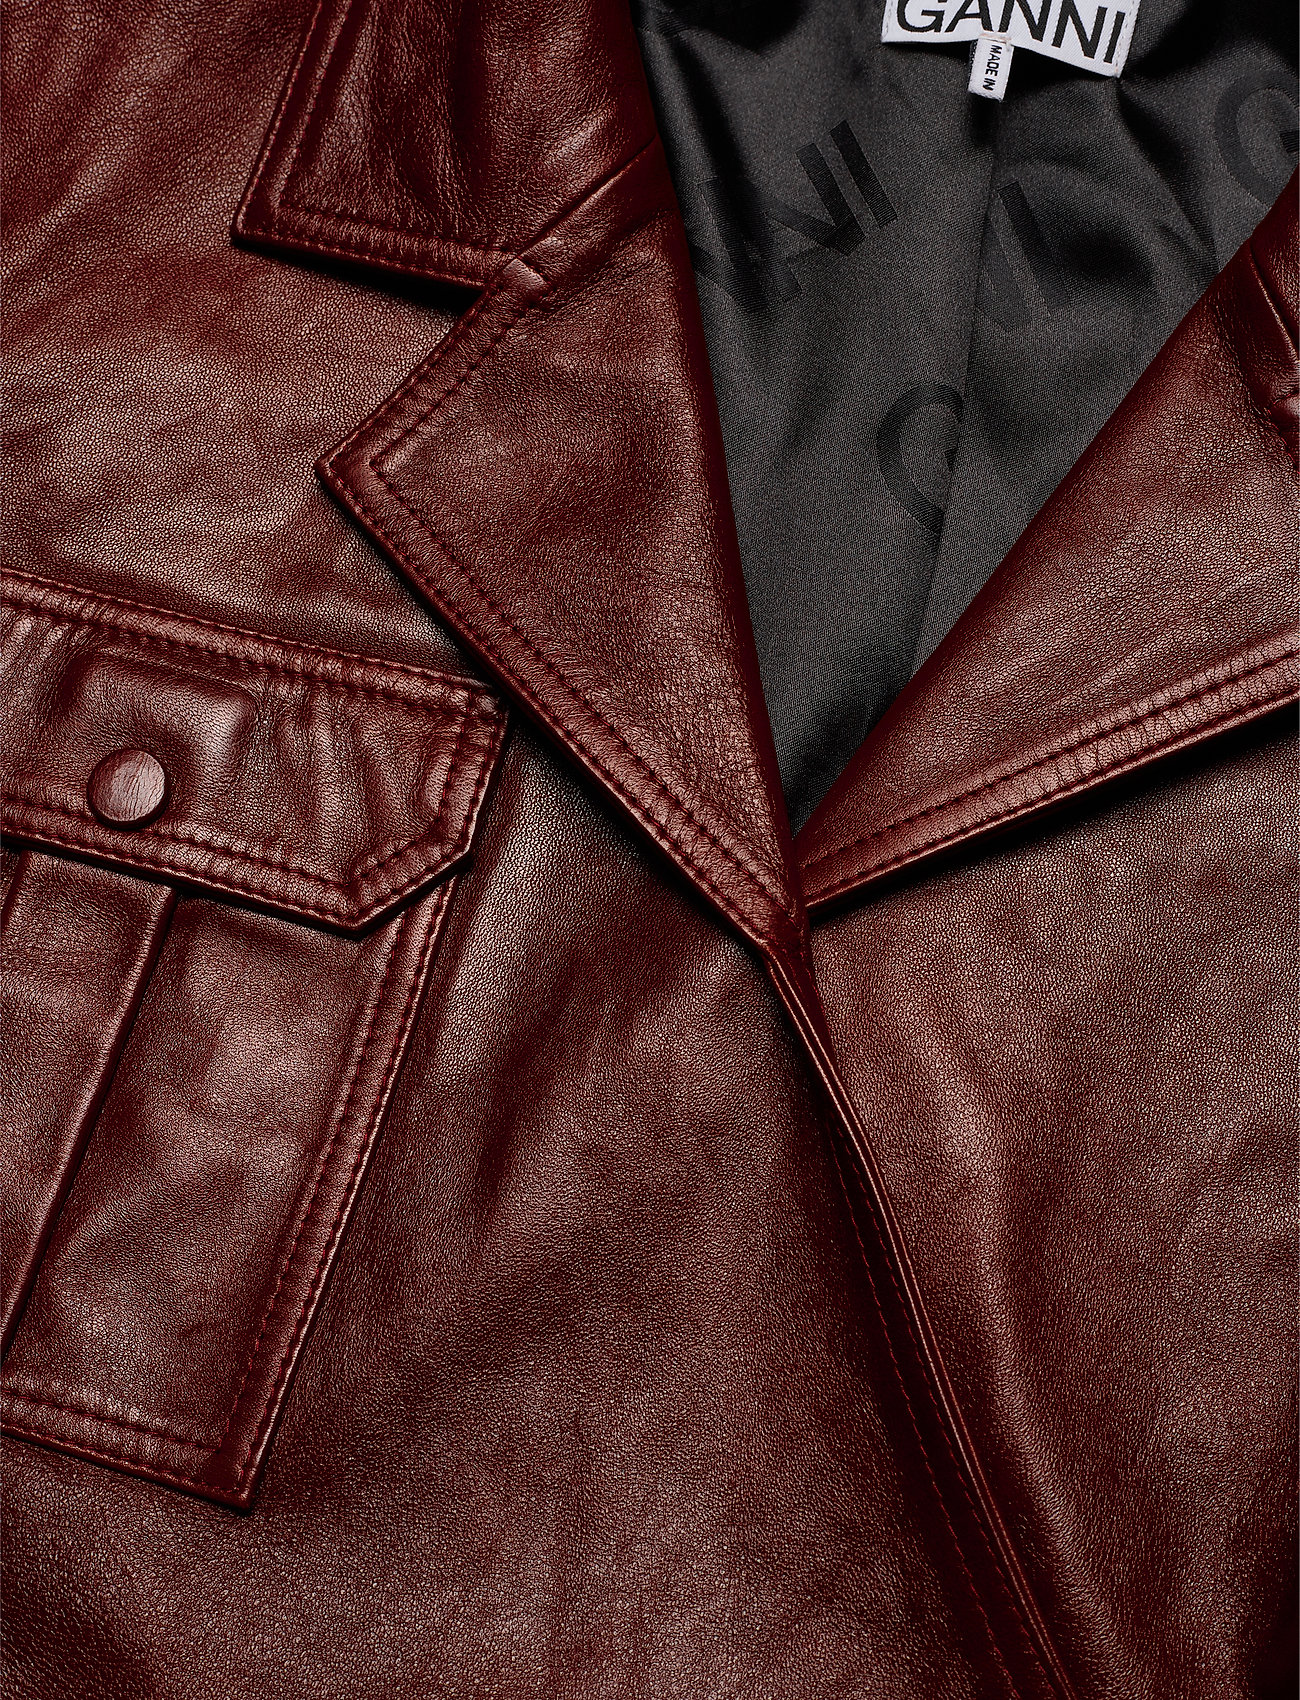 Ganni Lamb Leather - Blusar & Skjortor Decadent Chocolate